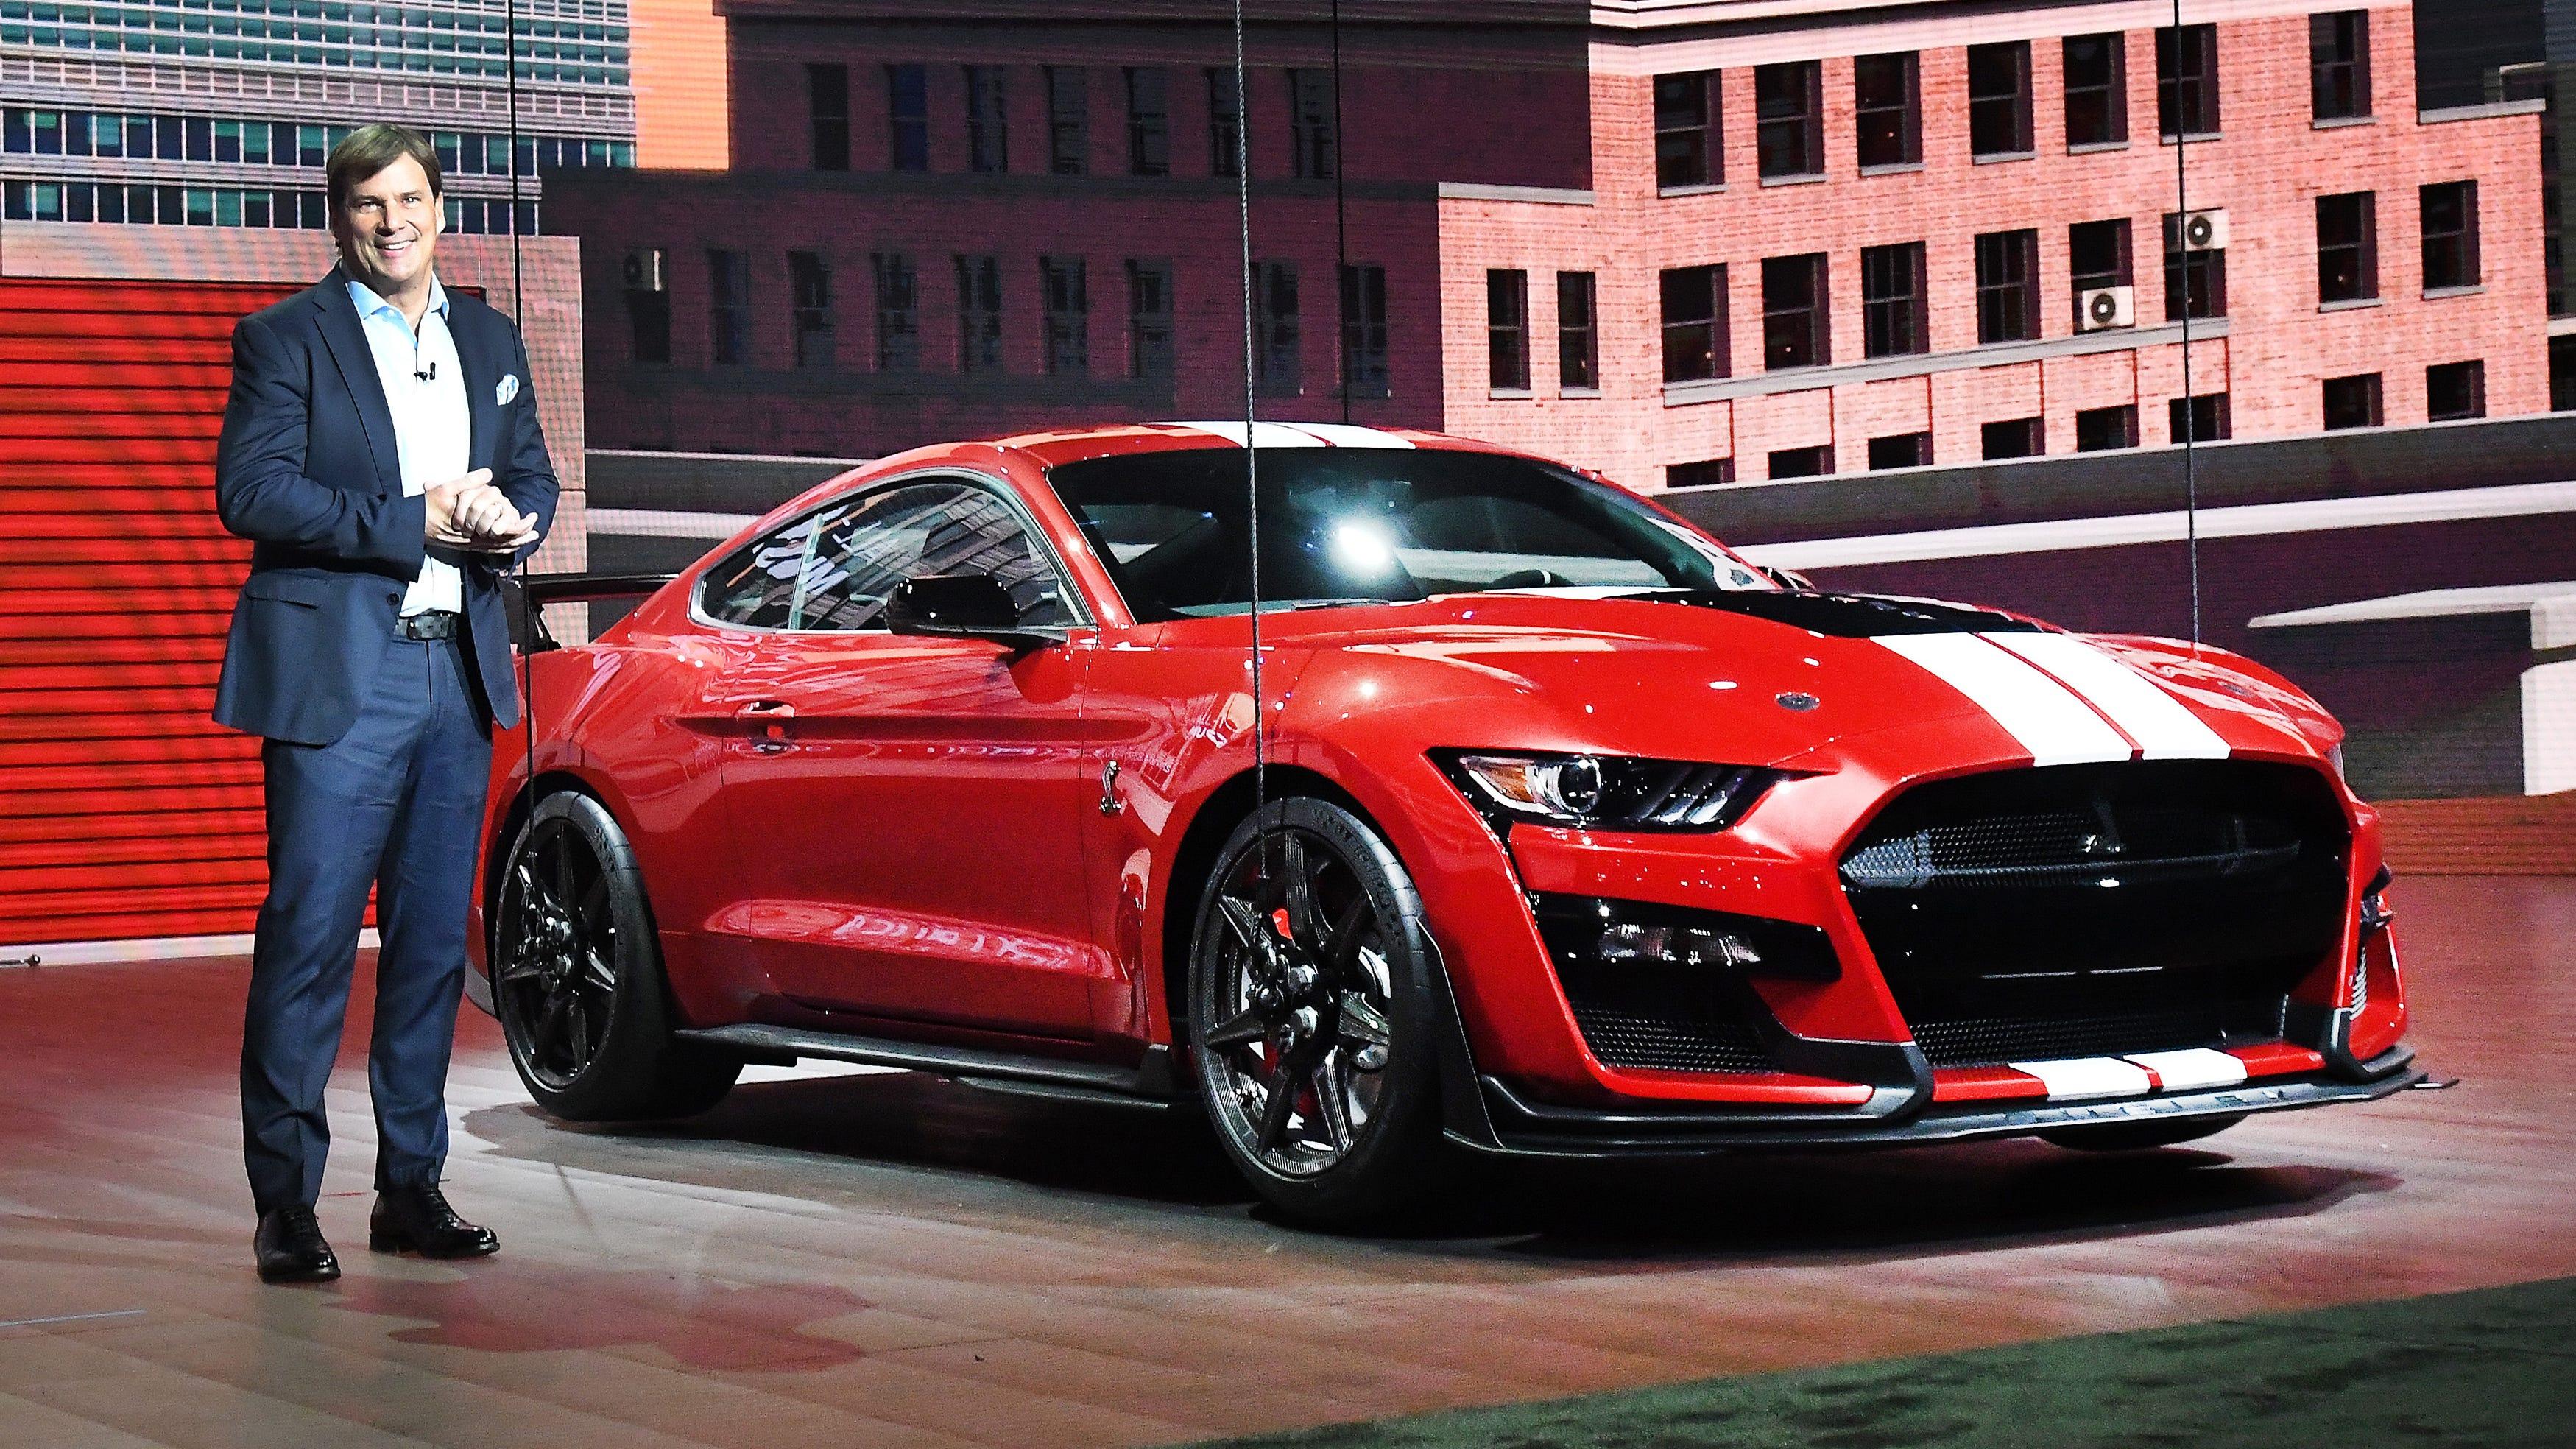 Detroit auto show consumer guide: Sports cars